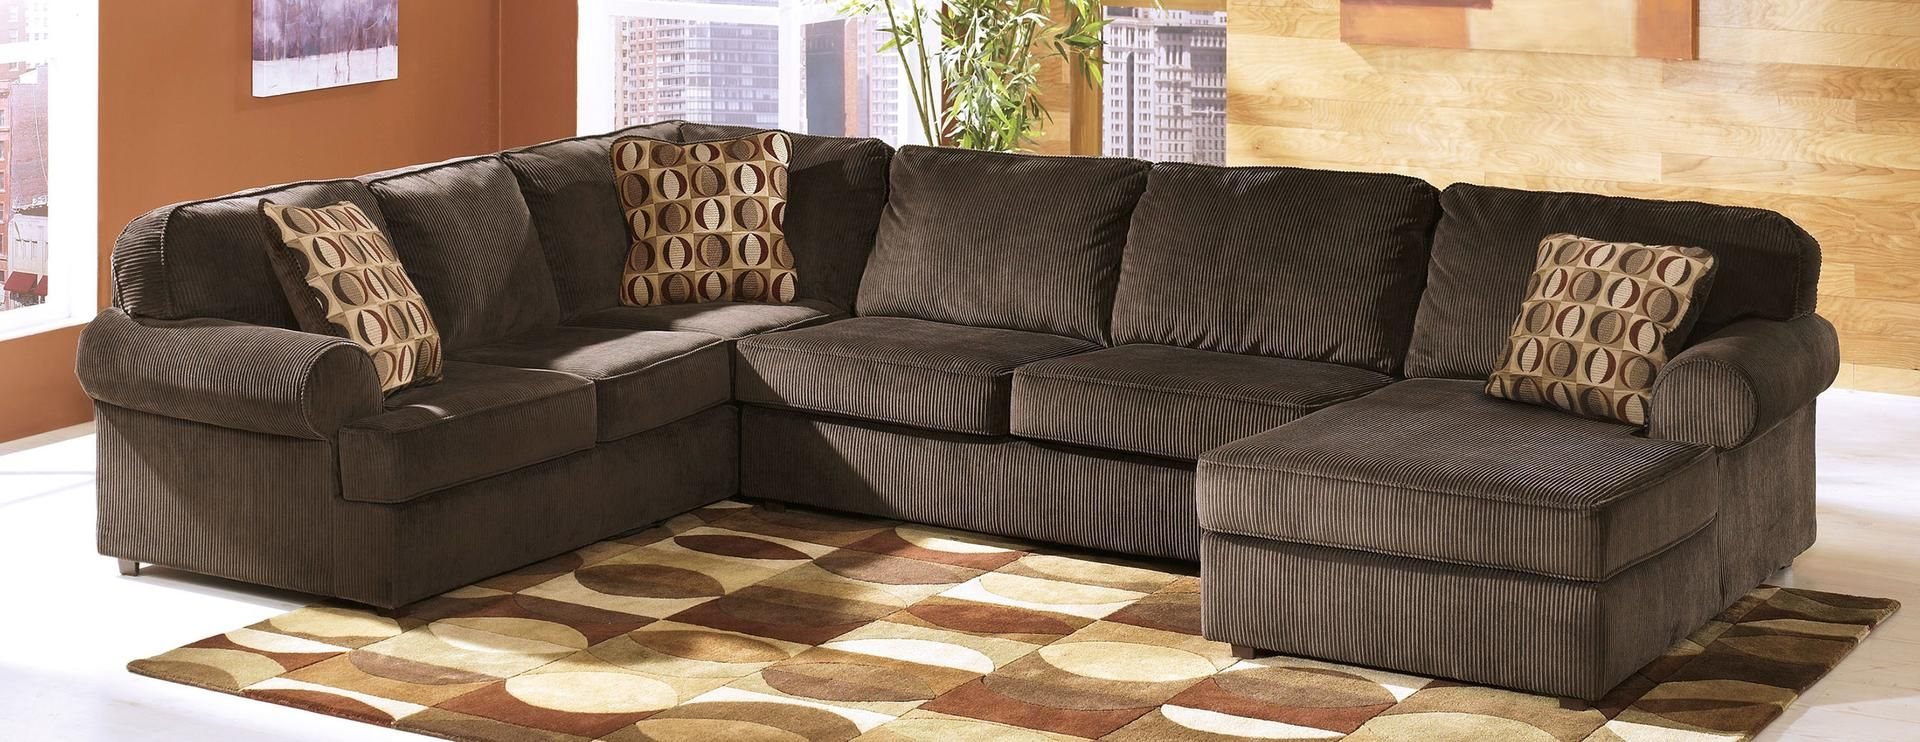 Ashley 68404173466 Vista Series Stationary Fabric Sofa ...